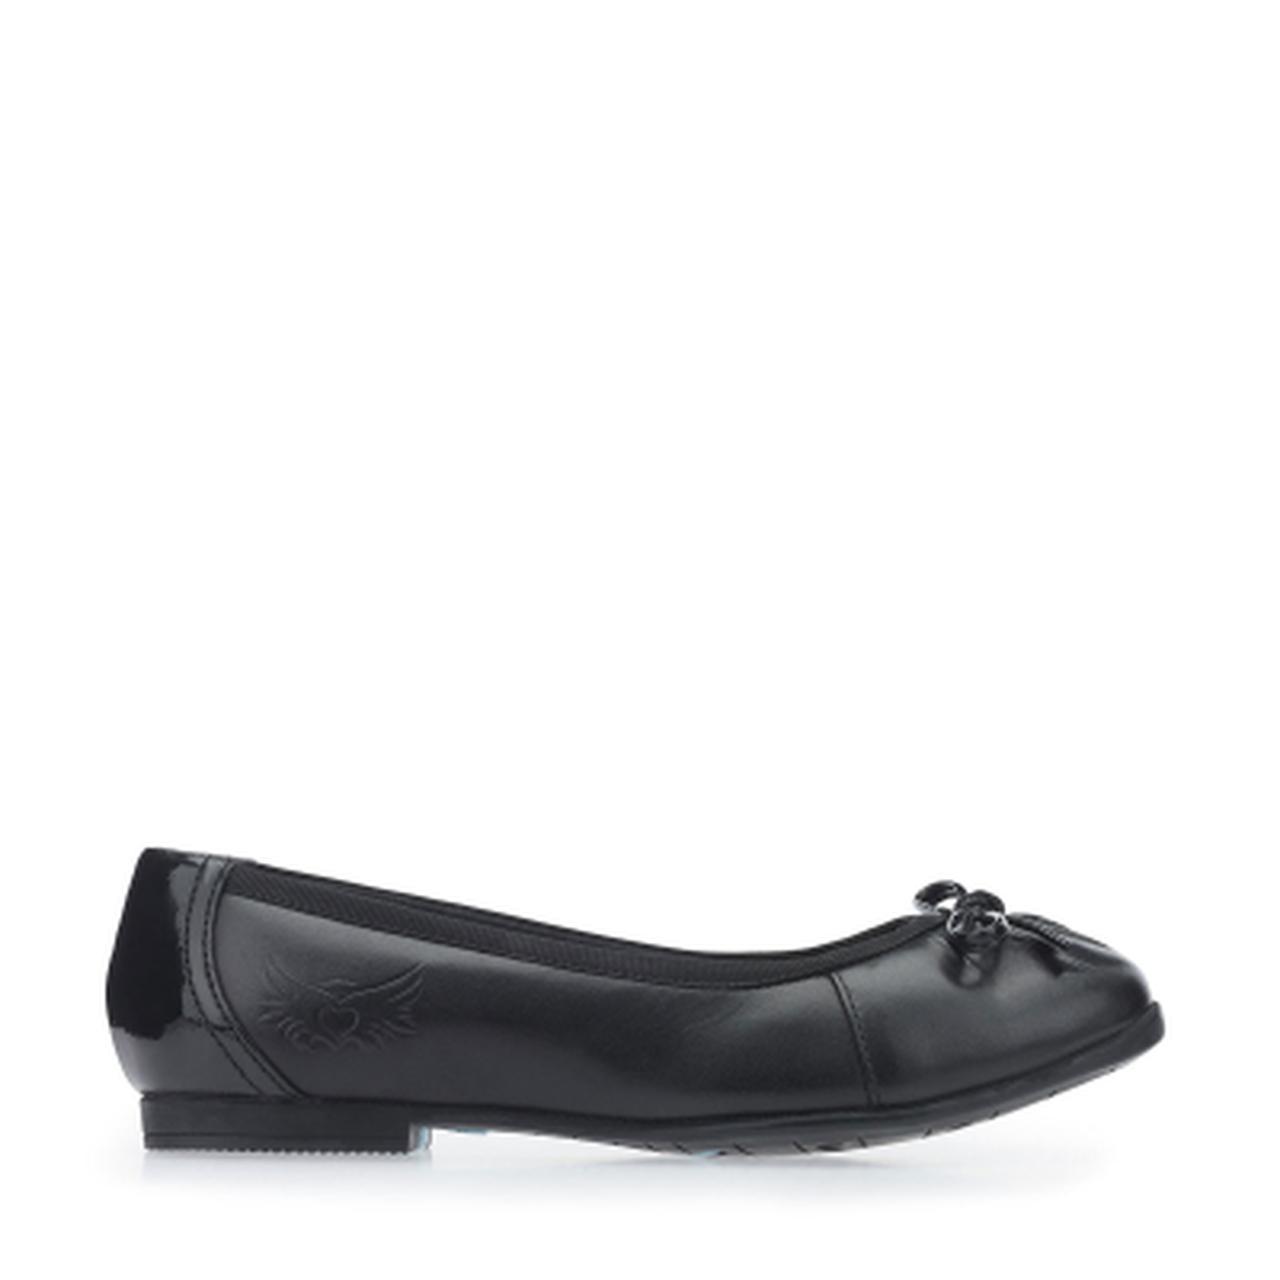 Ballerina Black Leather School Shoes